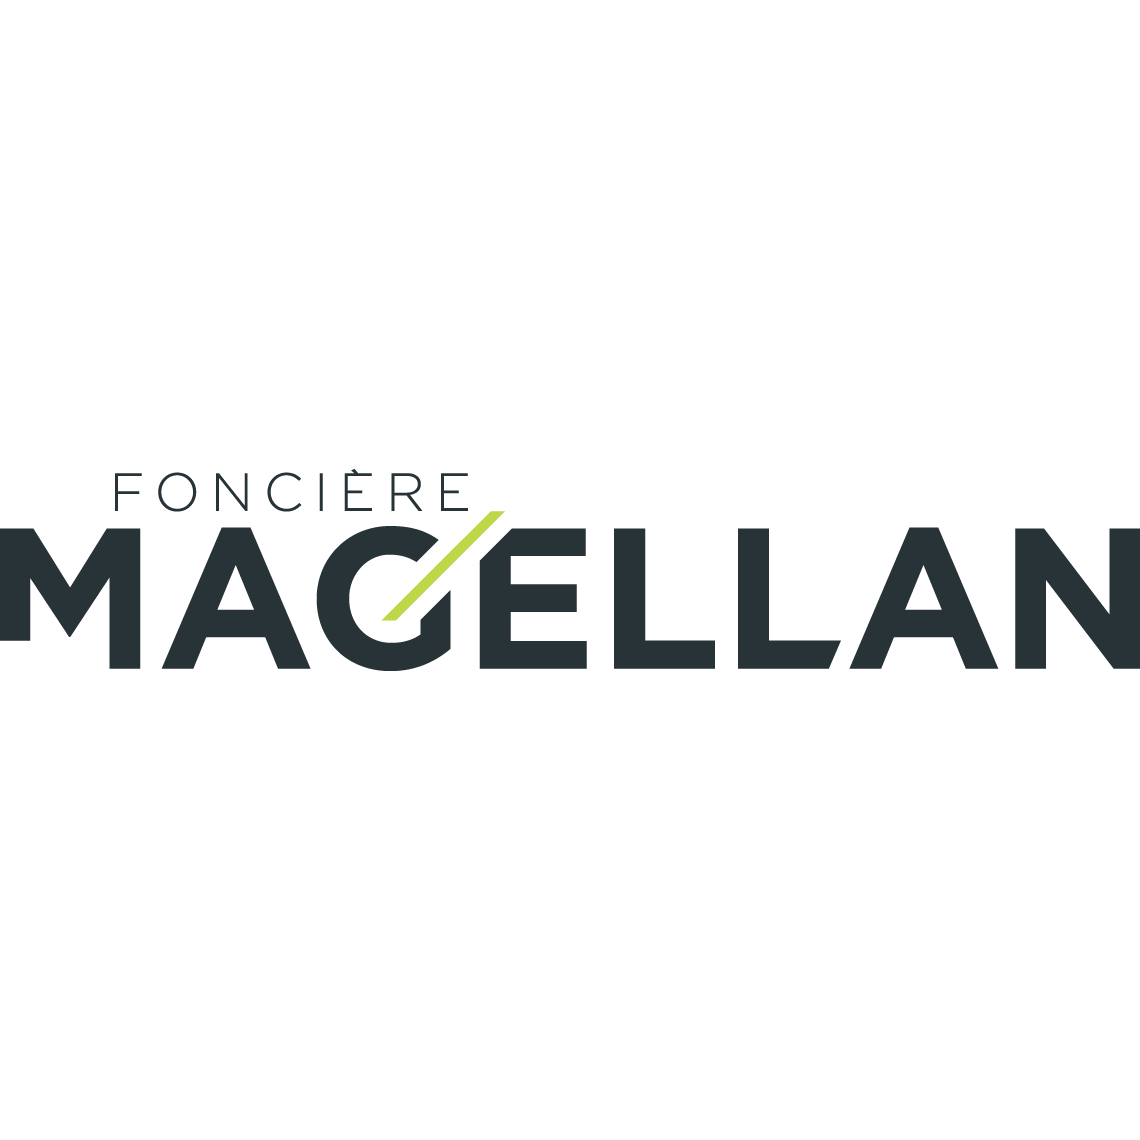 FONCIÈRE MAGELLAN